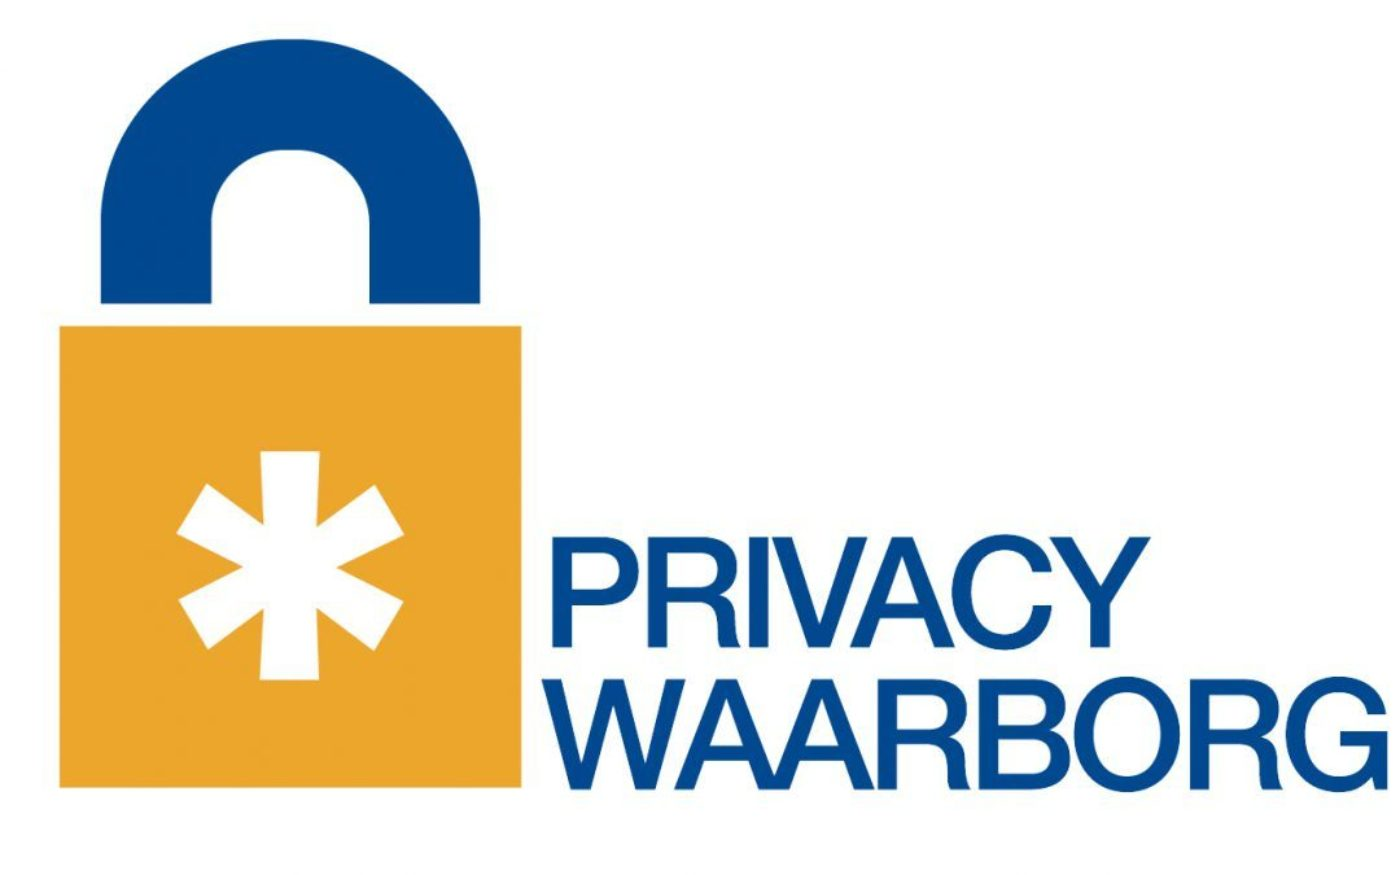 Privacy Waarborg logo